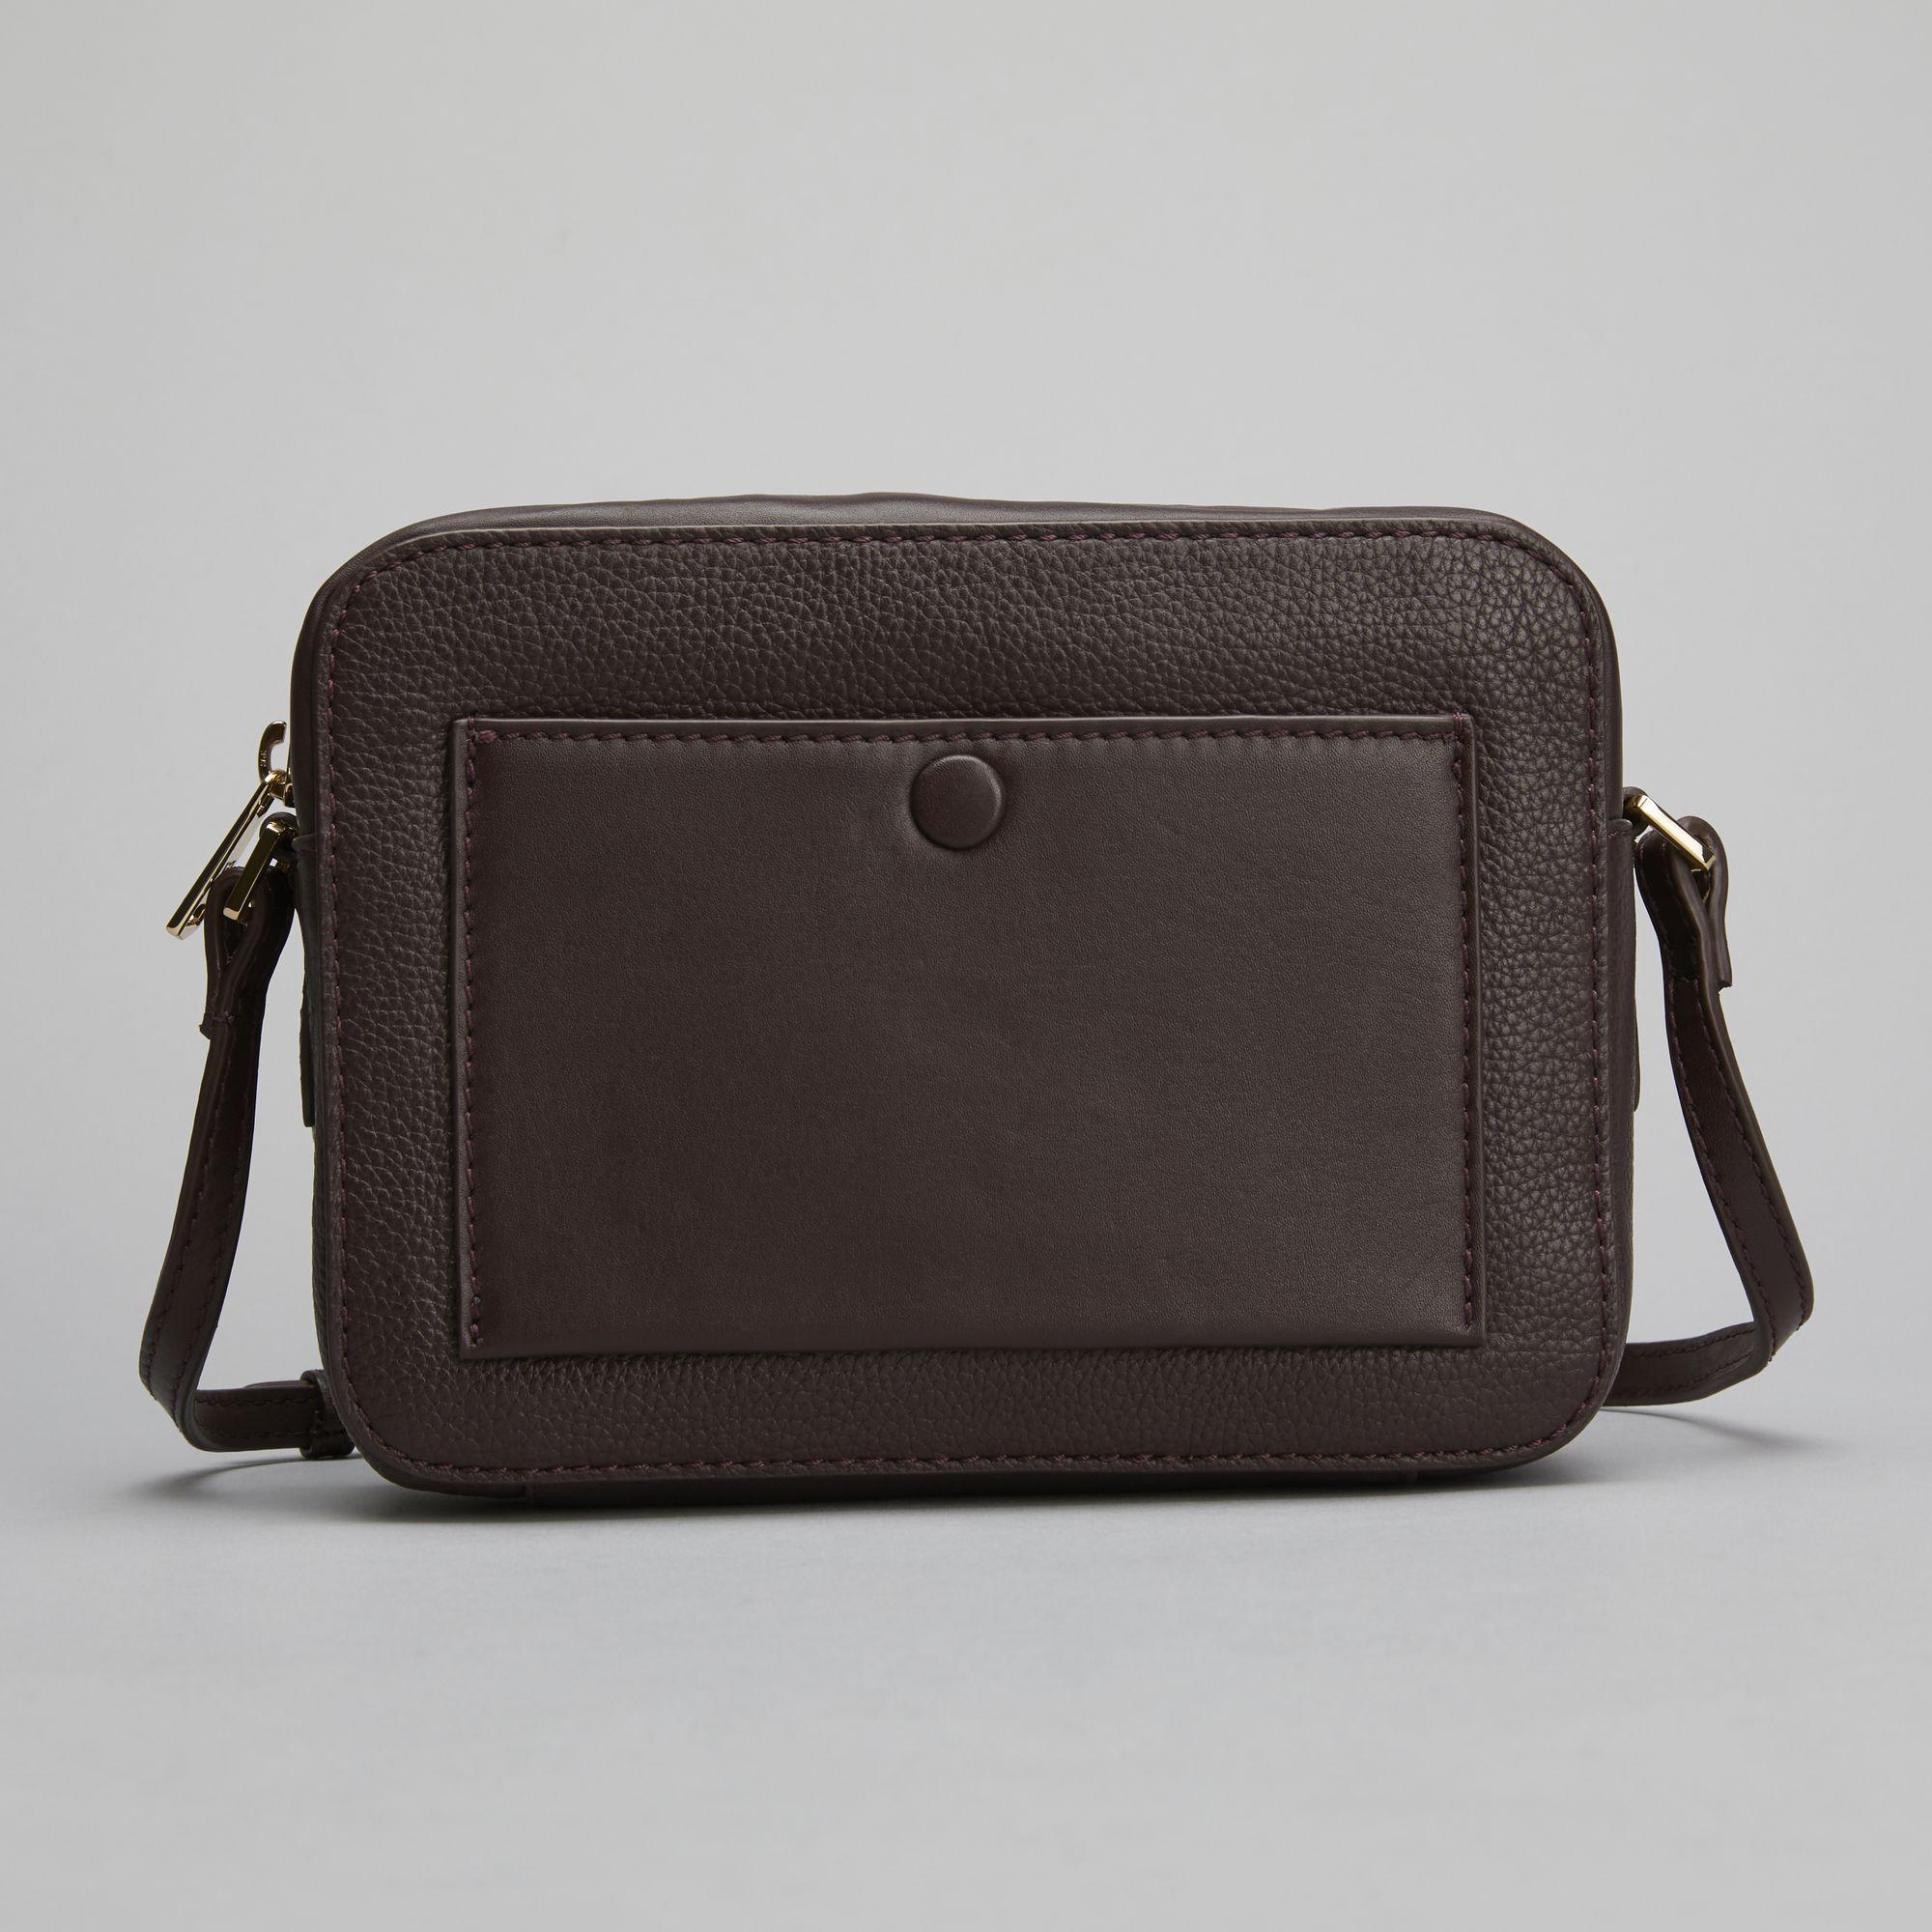 Don Donna Belinda Camerabag, väska i skinn, Bordeaux